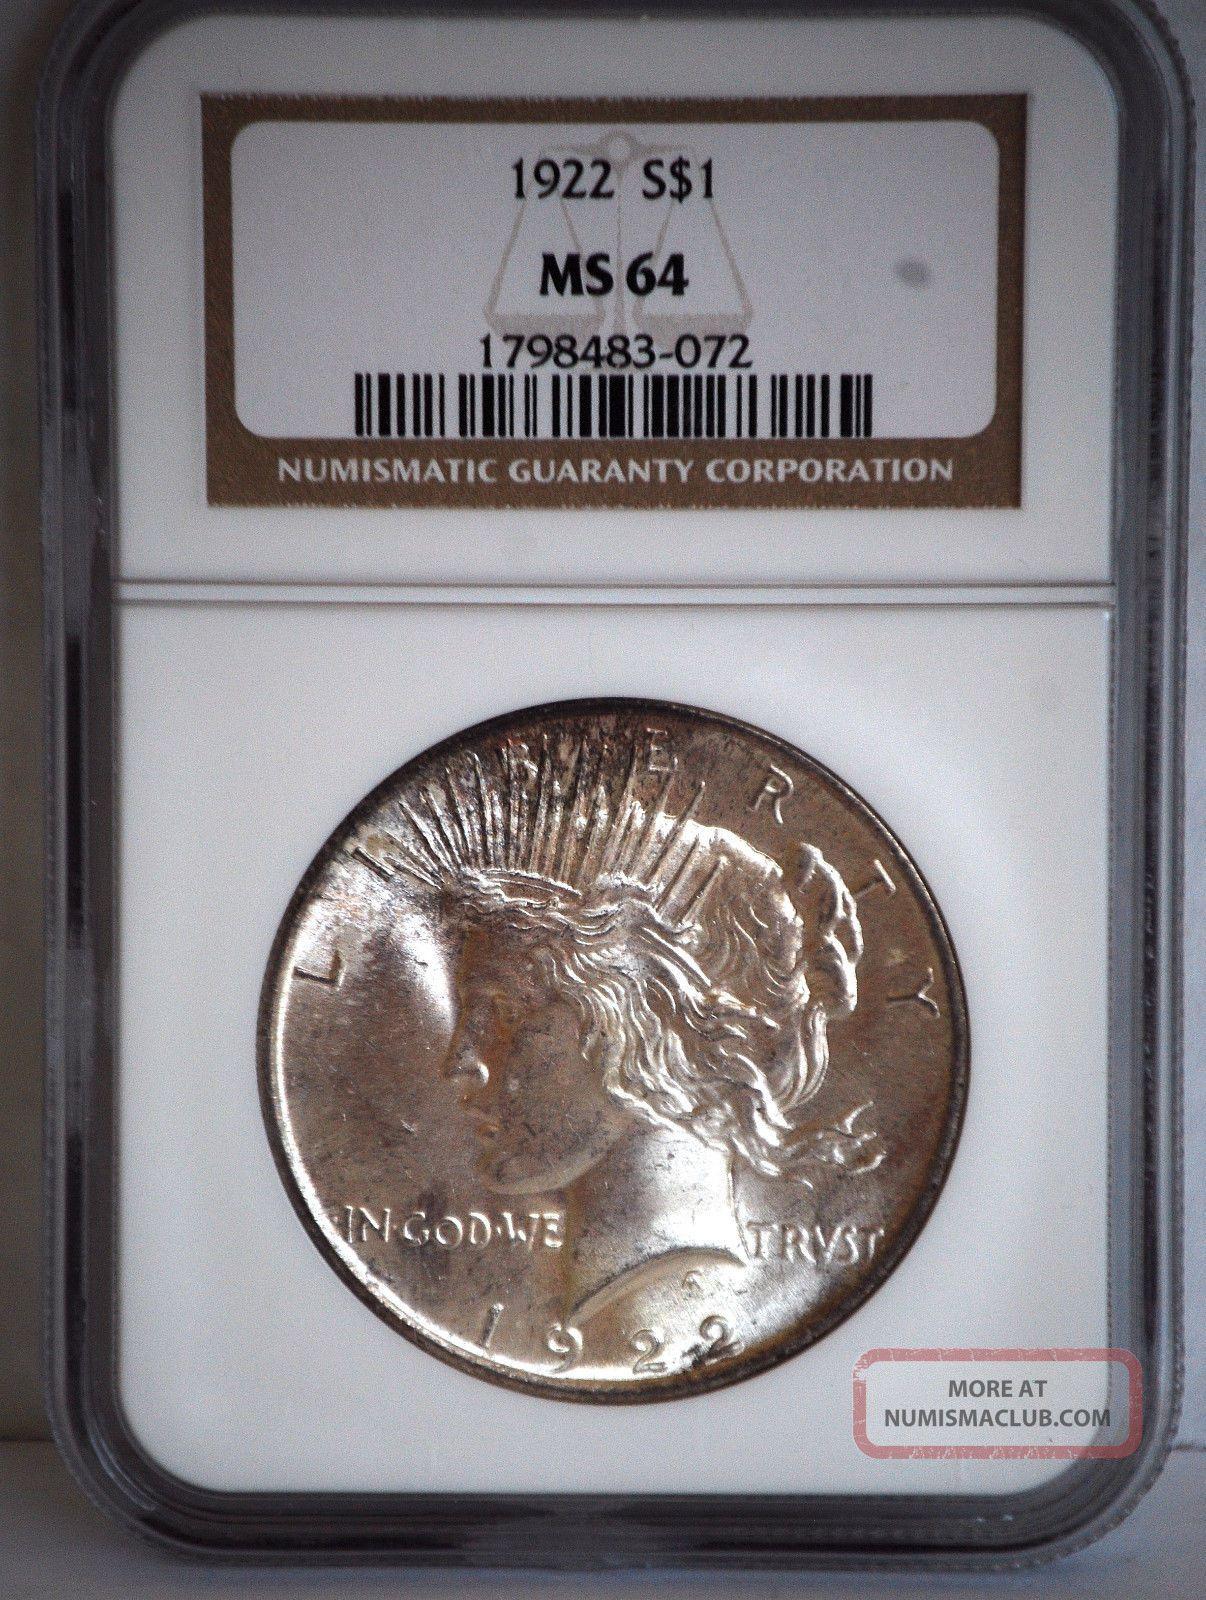 1922 P Silver Peace Dollar Ngc Ms64 1798483 - 072 Dollars photo